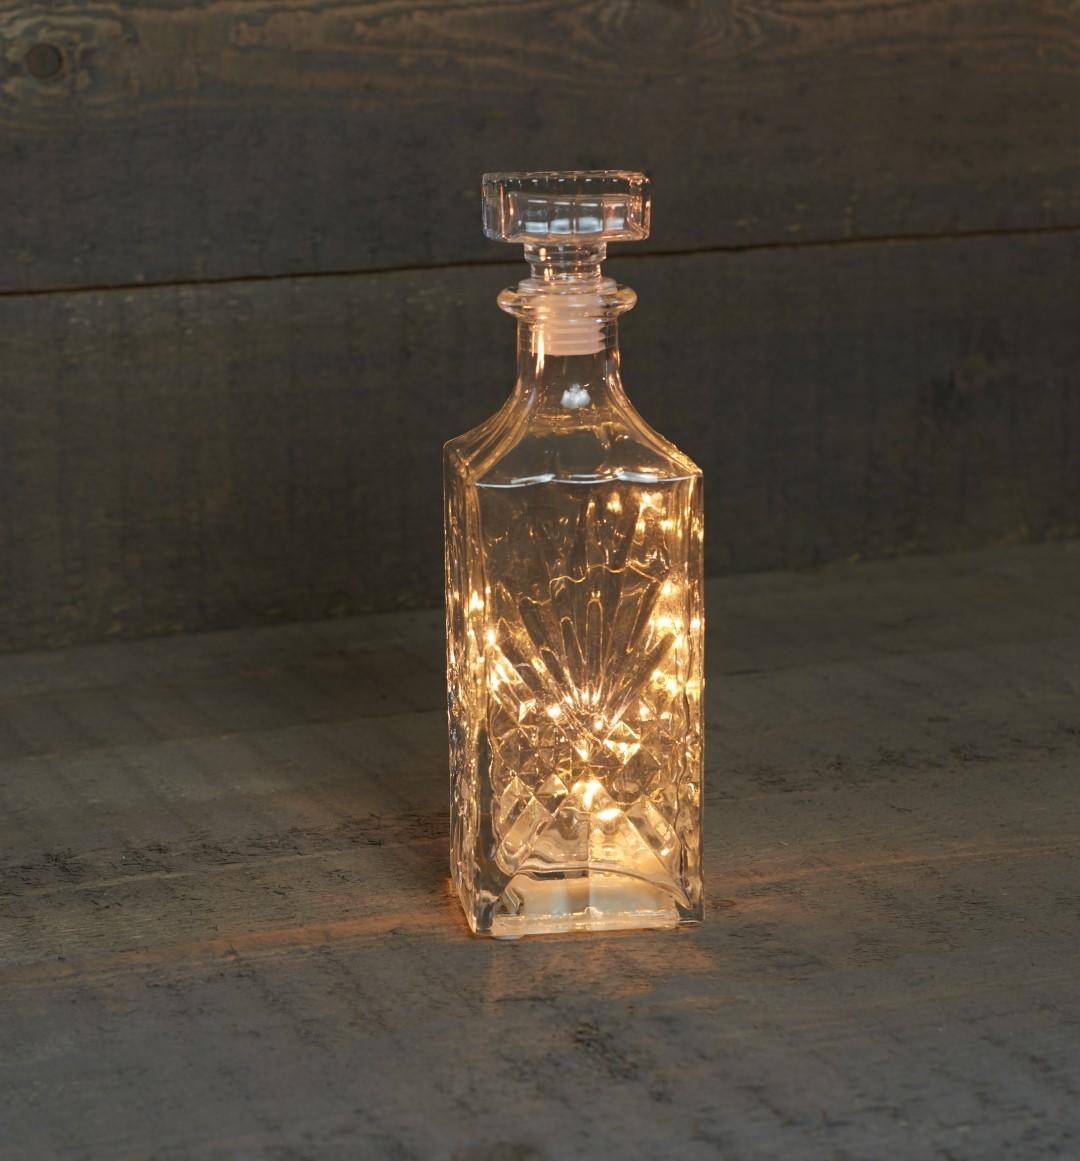 B.o. karaf 18 led timer 6h 8.5x27.5cm Anna's collection